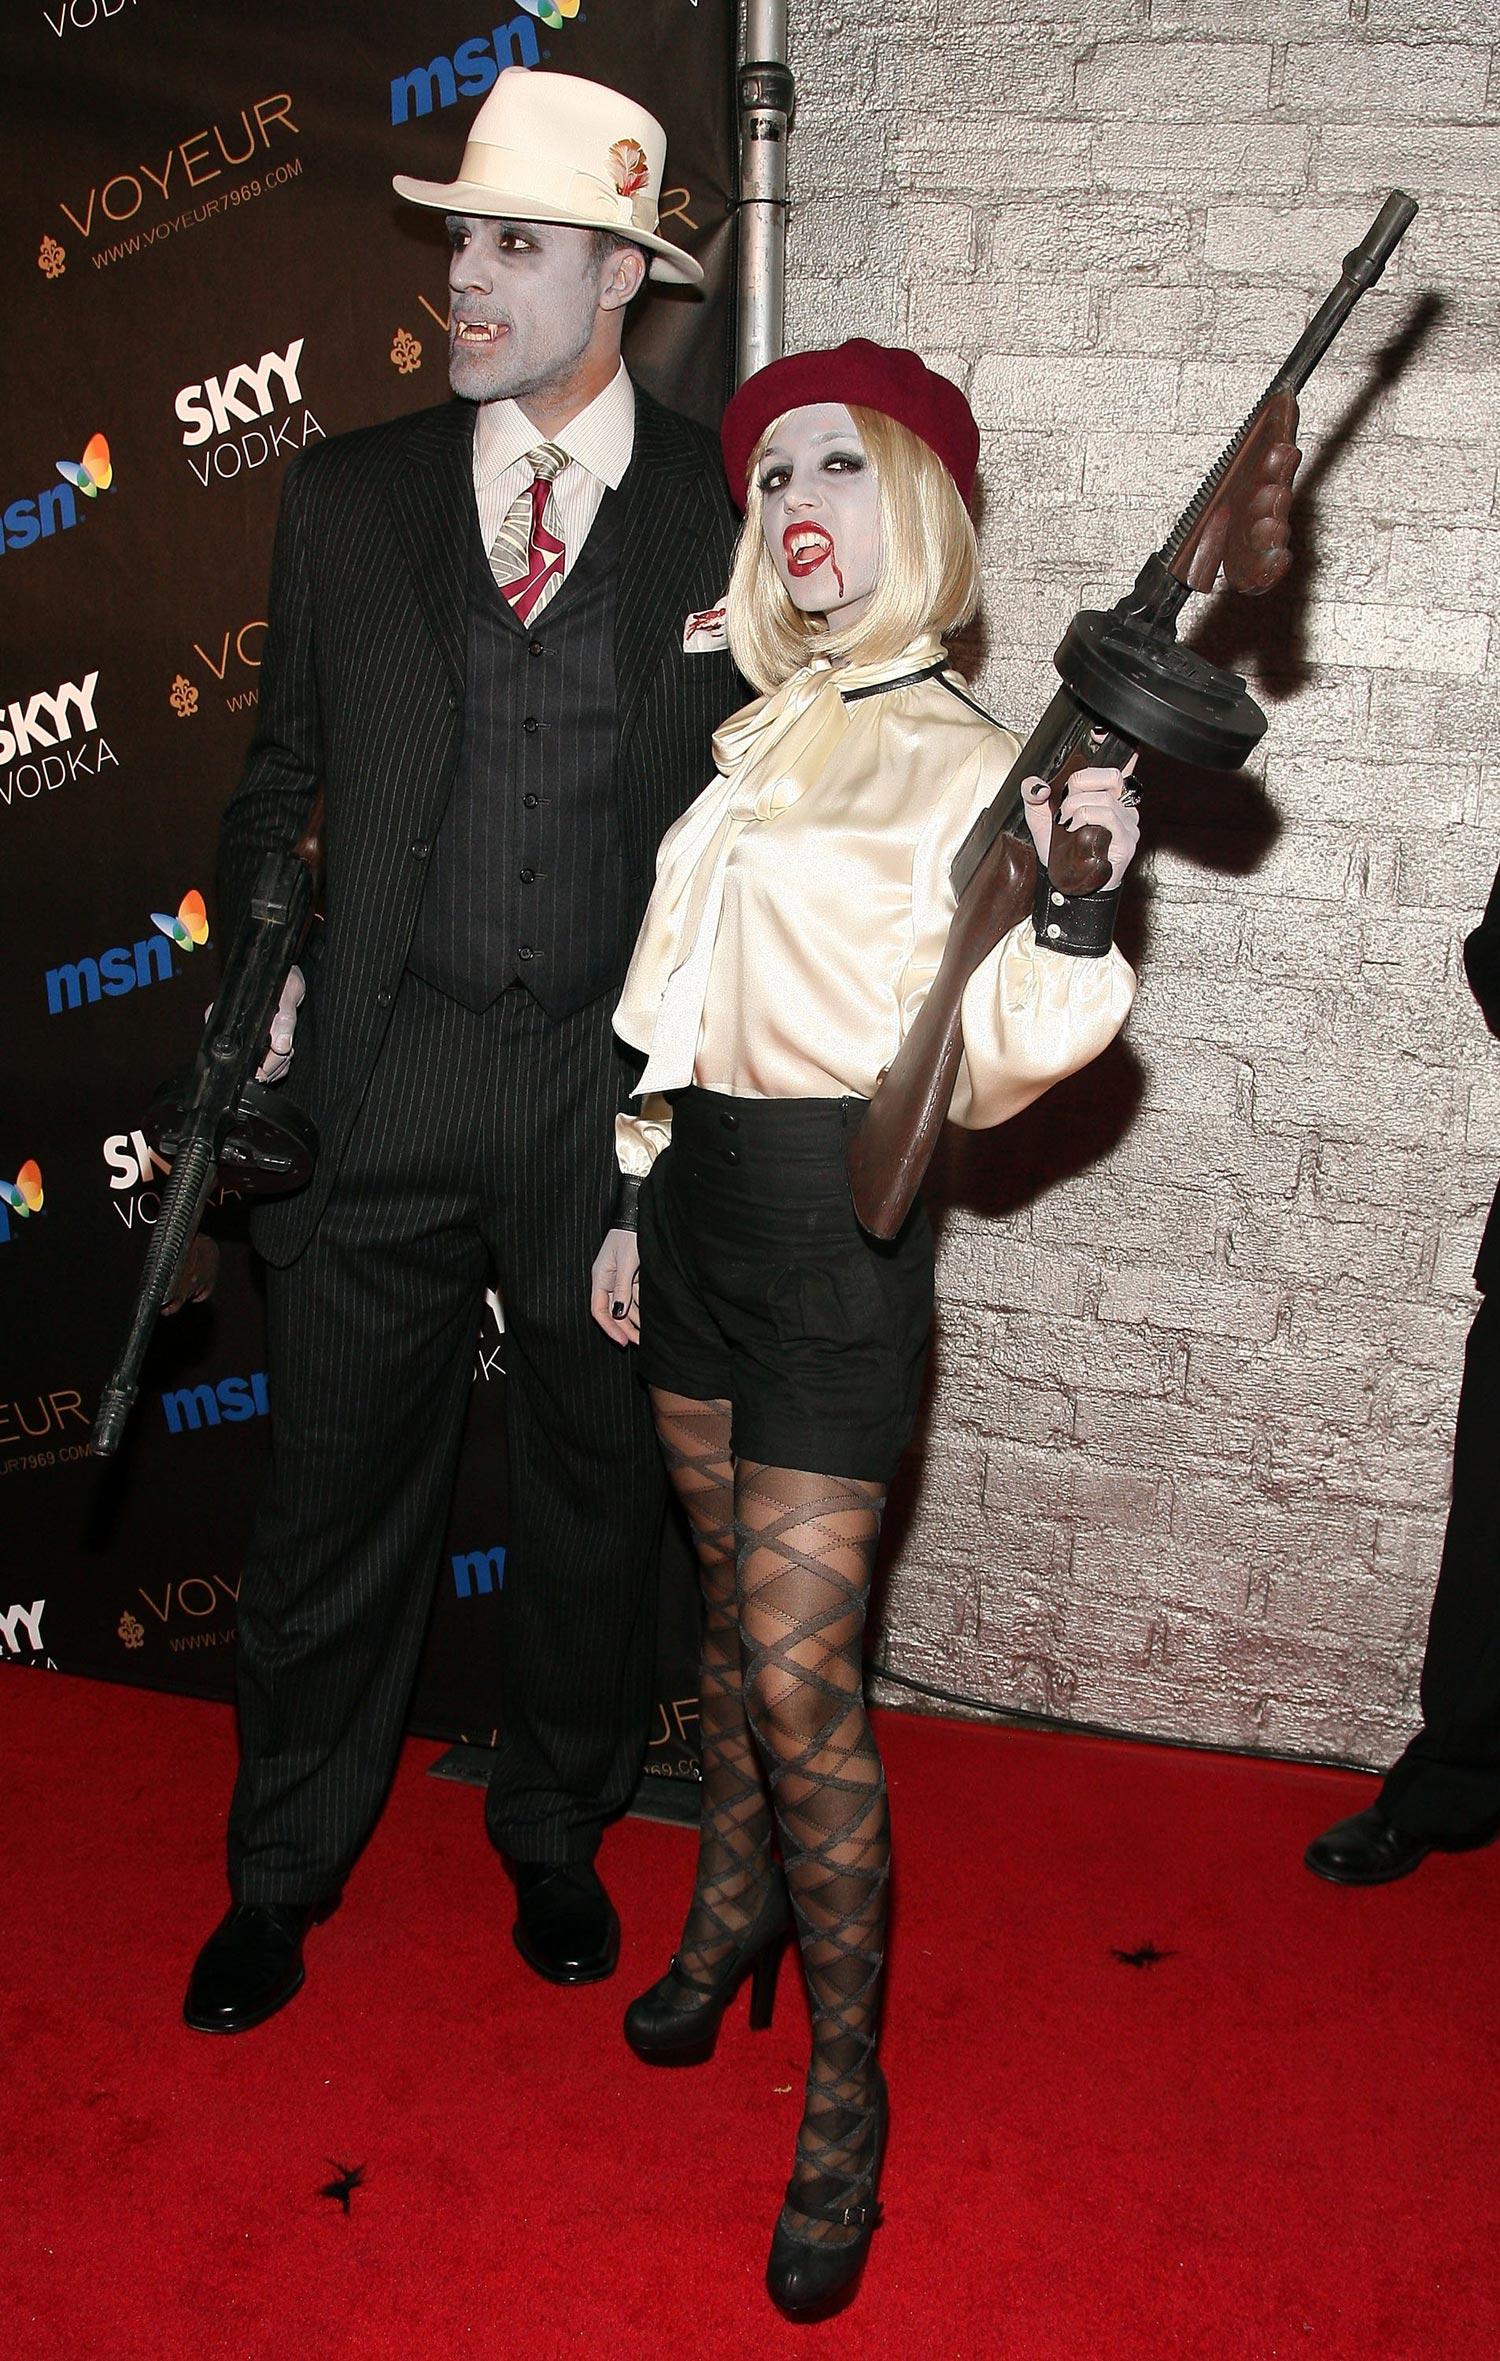 Eliza Dushku - Heidi Klum 2009 Halloween Party - High Quality ...